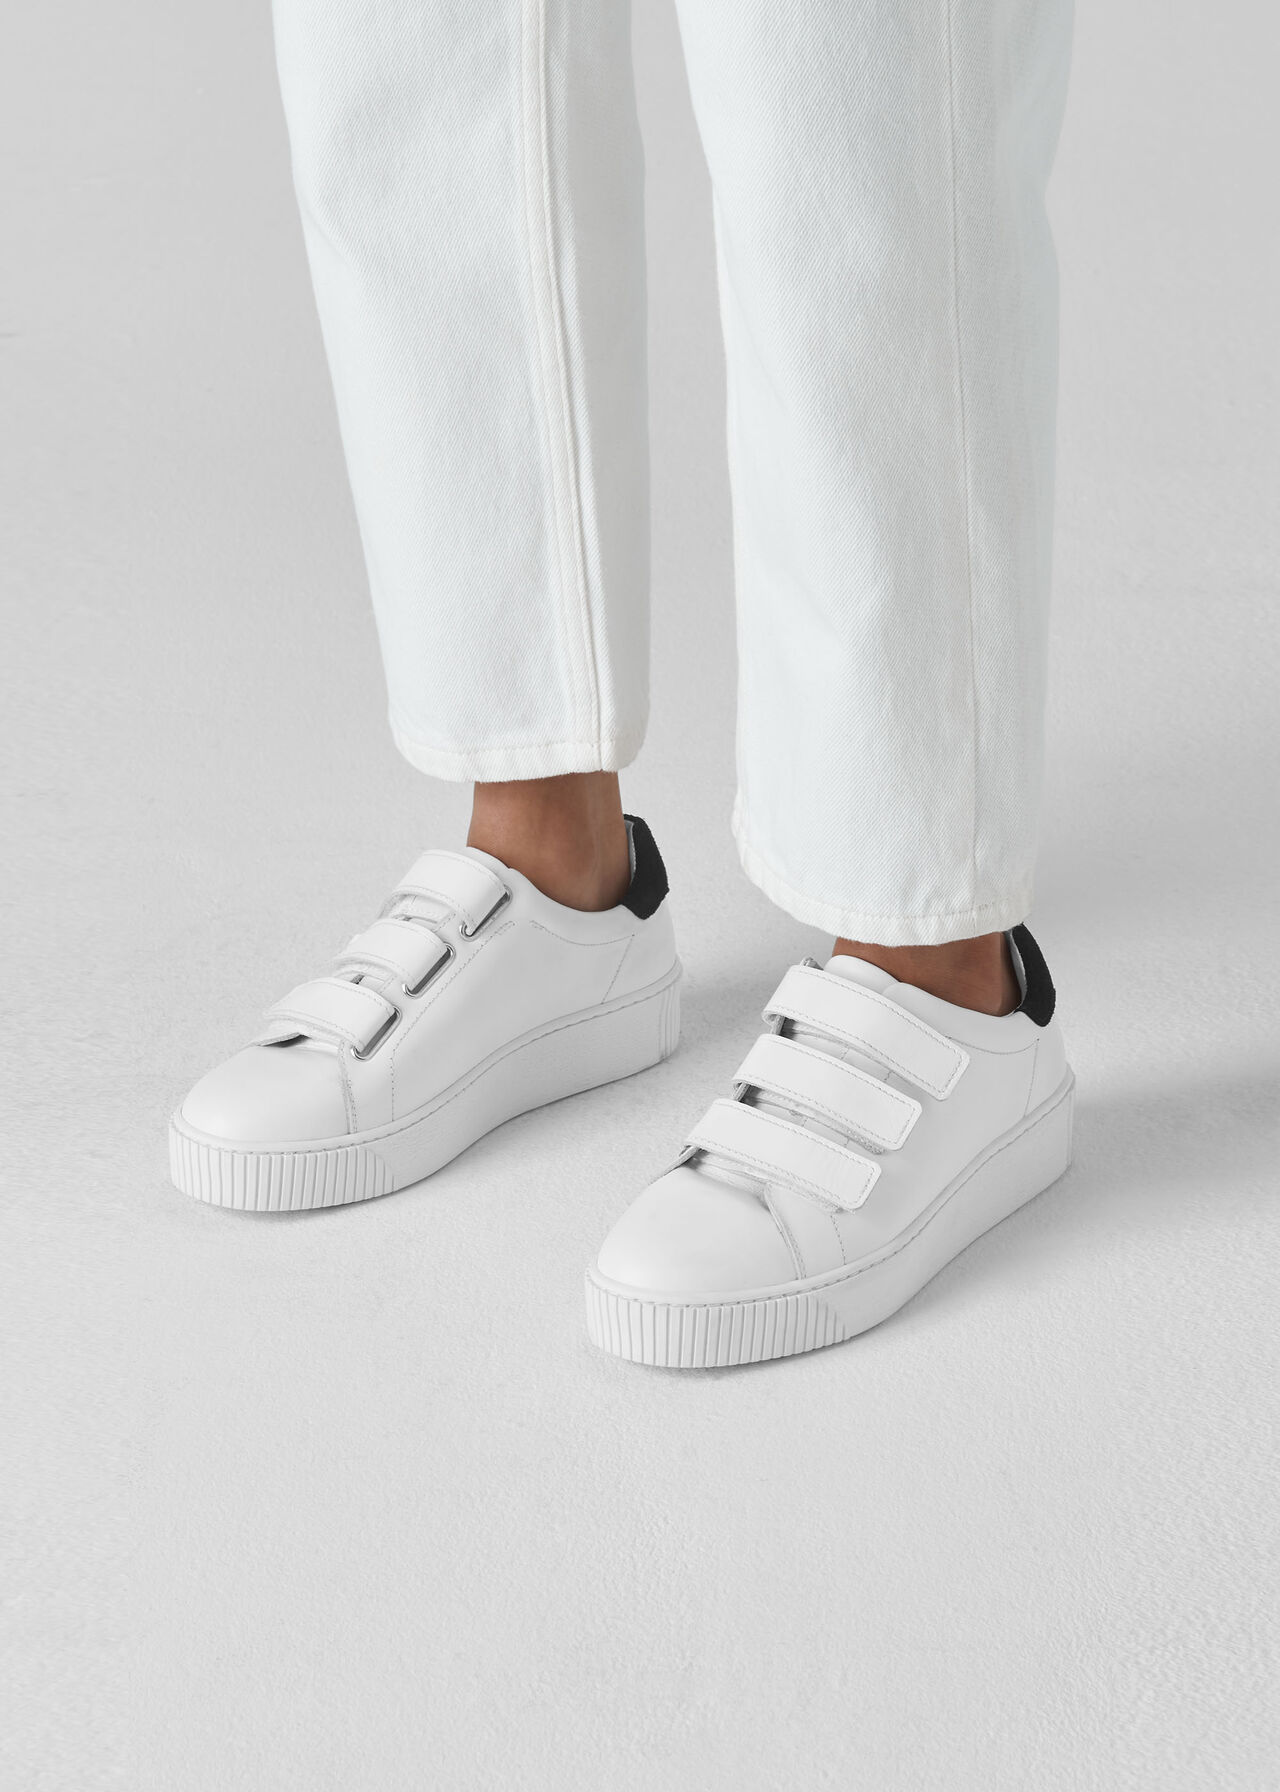 Flax Velcro Trainer White